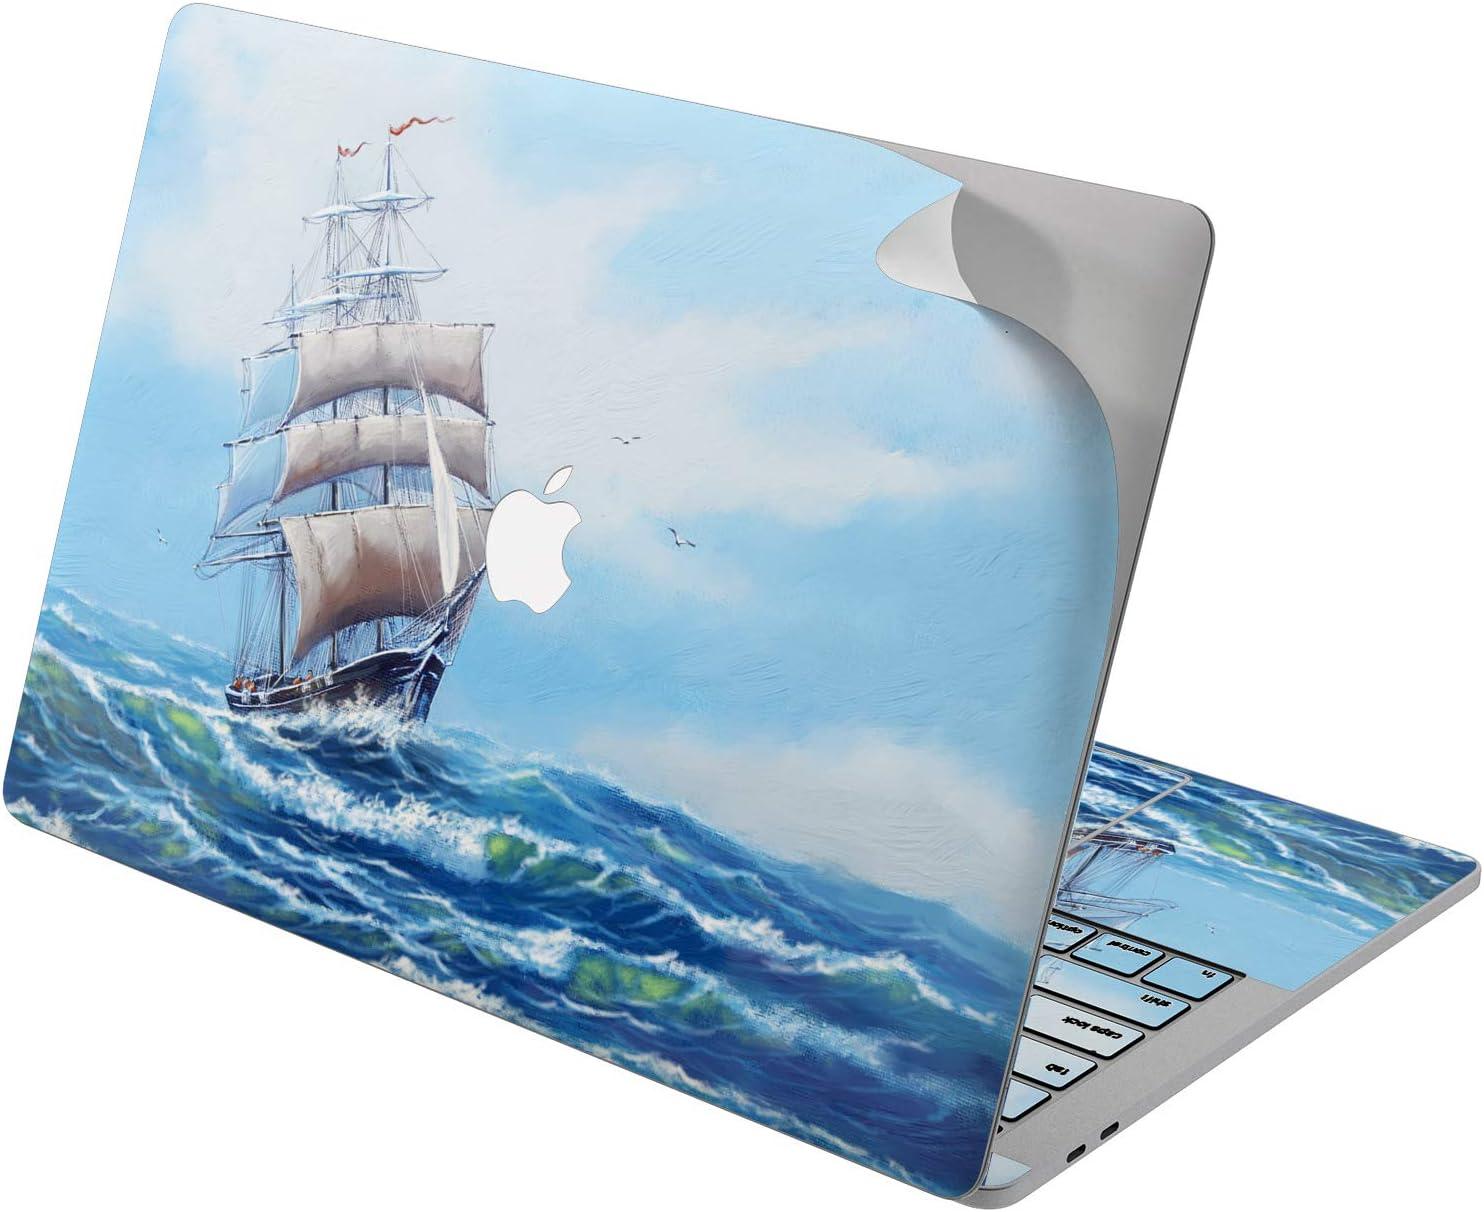 "Cavka Vinyl Decal Skin for Apple MacBook Pro 13"" 2019 15"" 2018 Air 13"" 2020 Retina 2015 Mac 11"" Mac 12"" Wave Cover Protective Print Artwork Ocean Ship Laptop Marine Sticker Sailing Paint Sea Design"